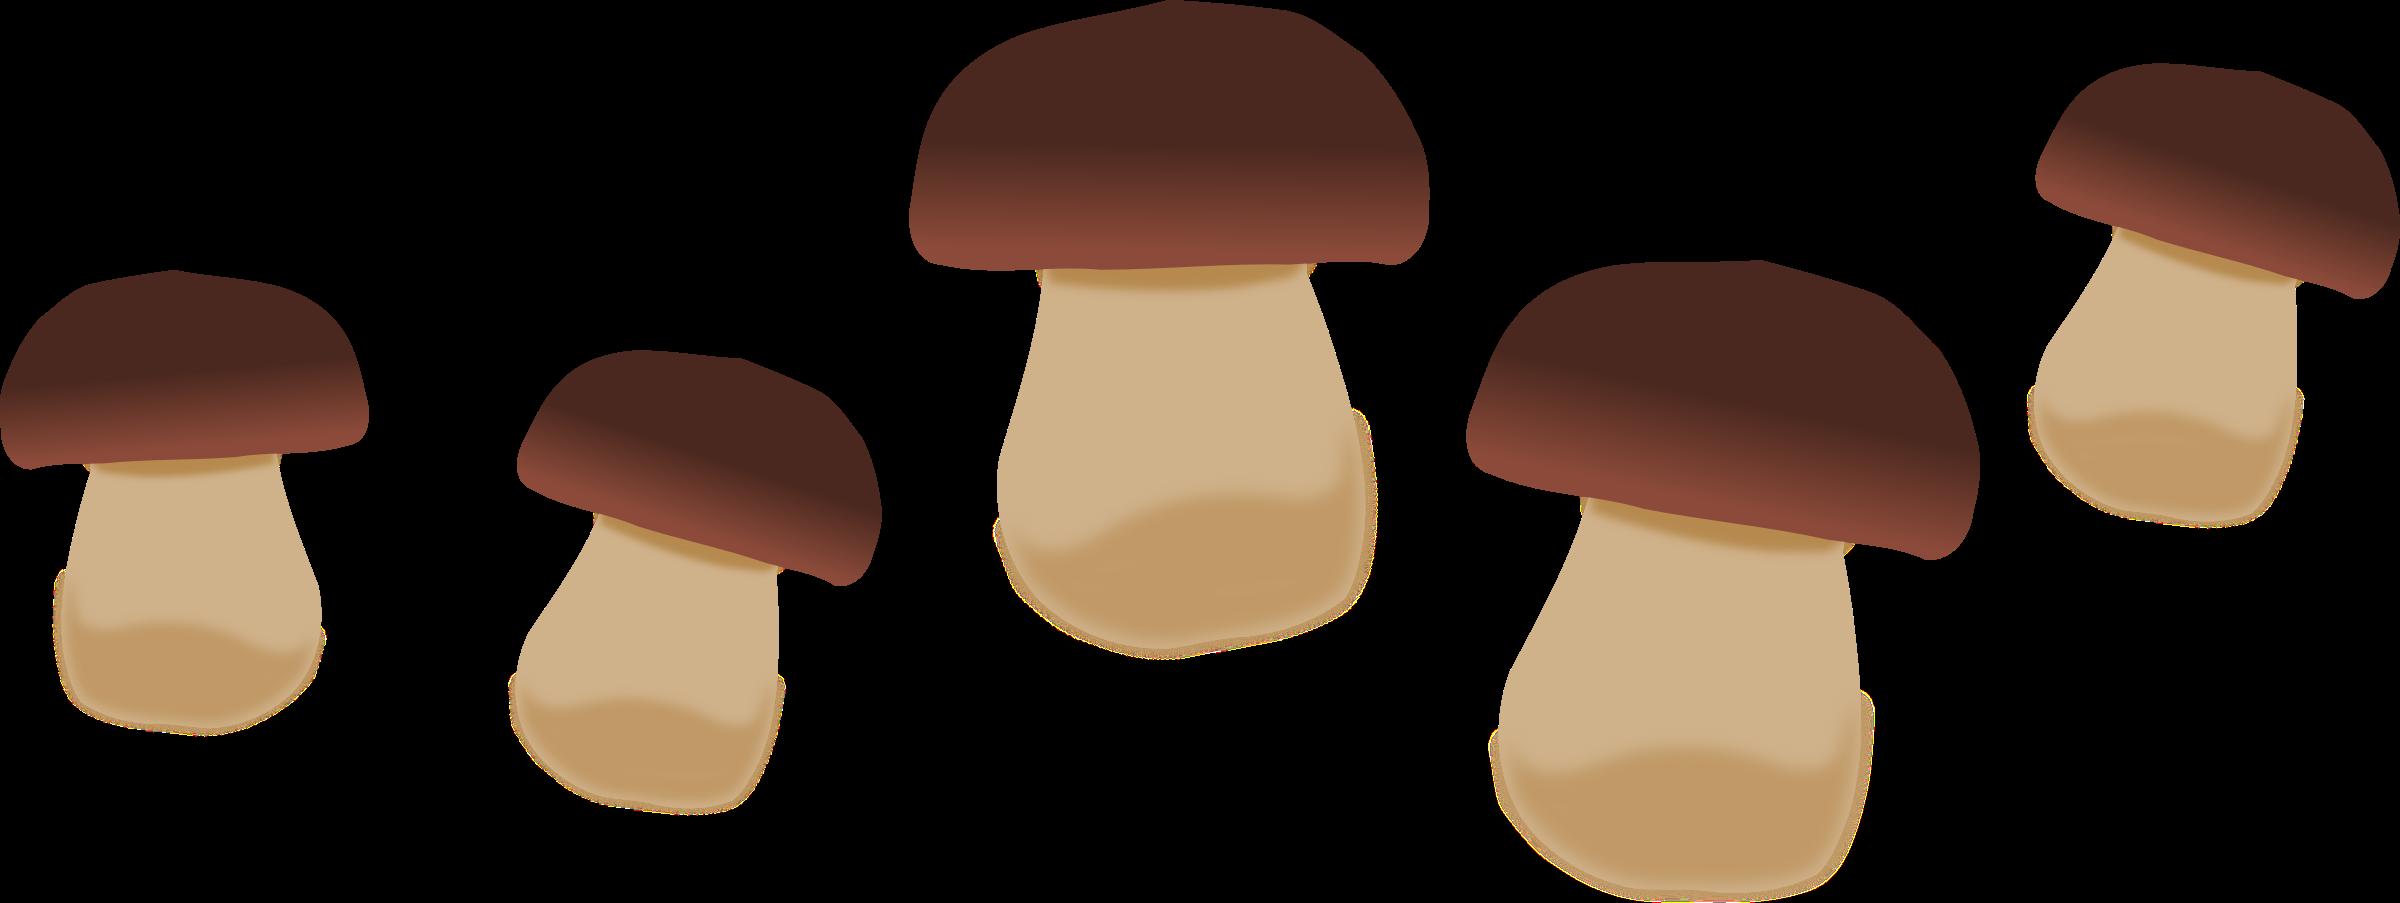 Big image png. Mushrooms clipart